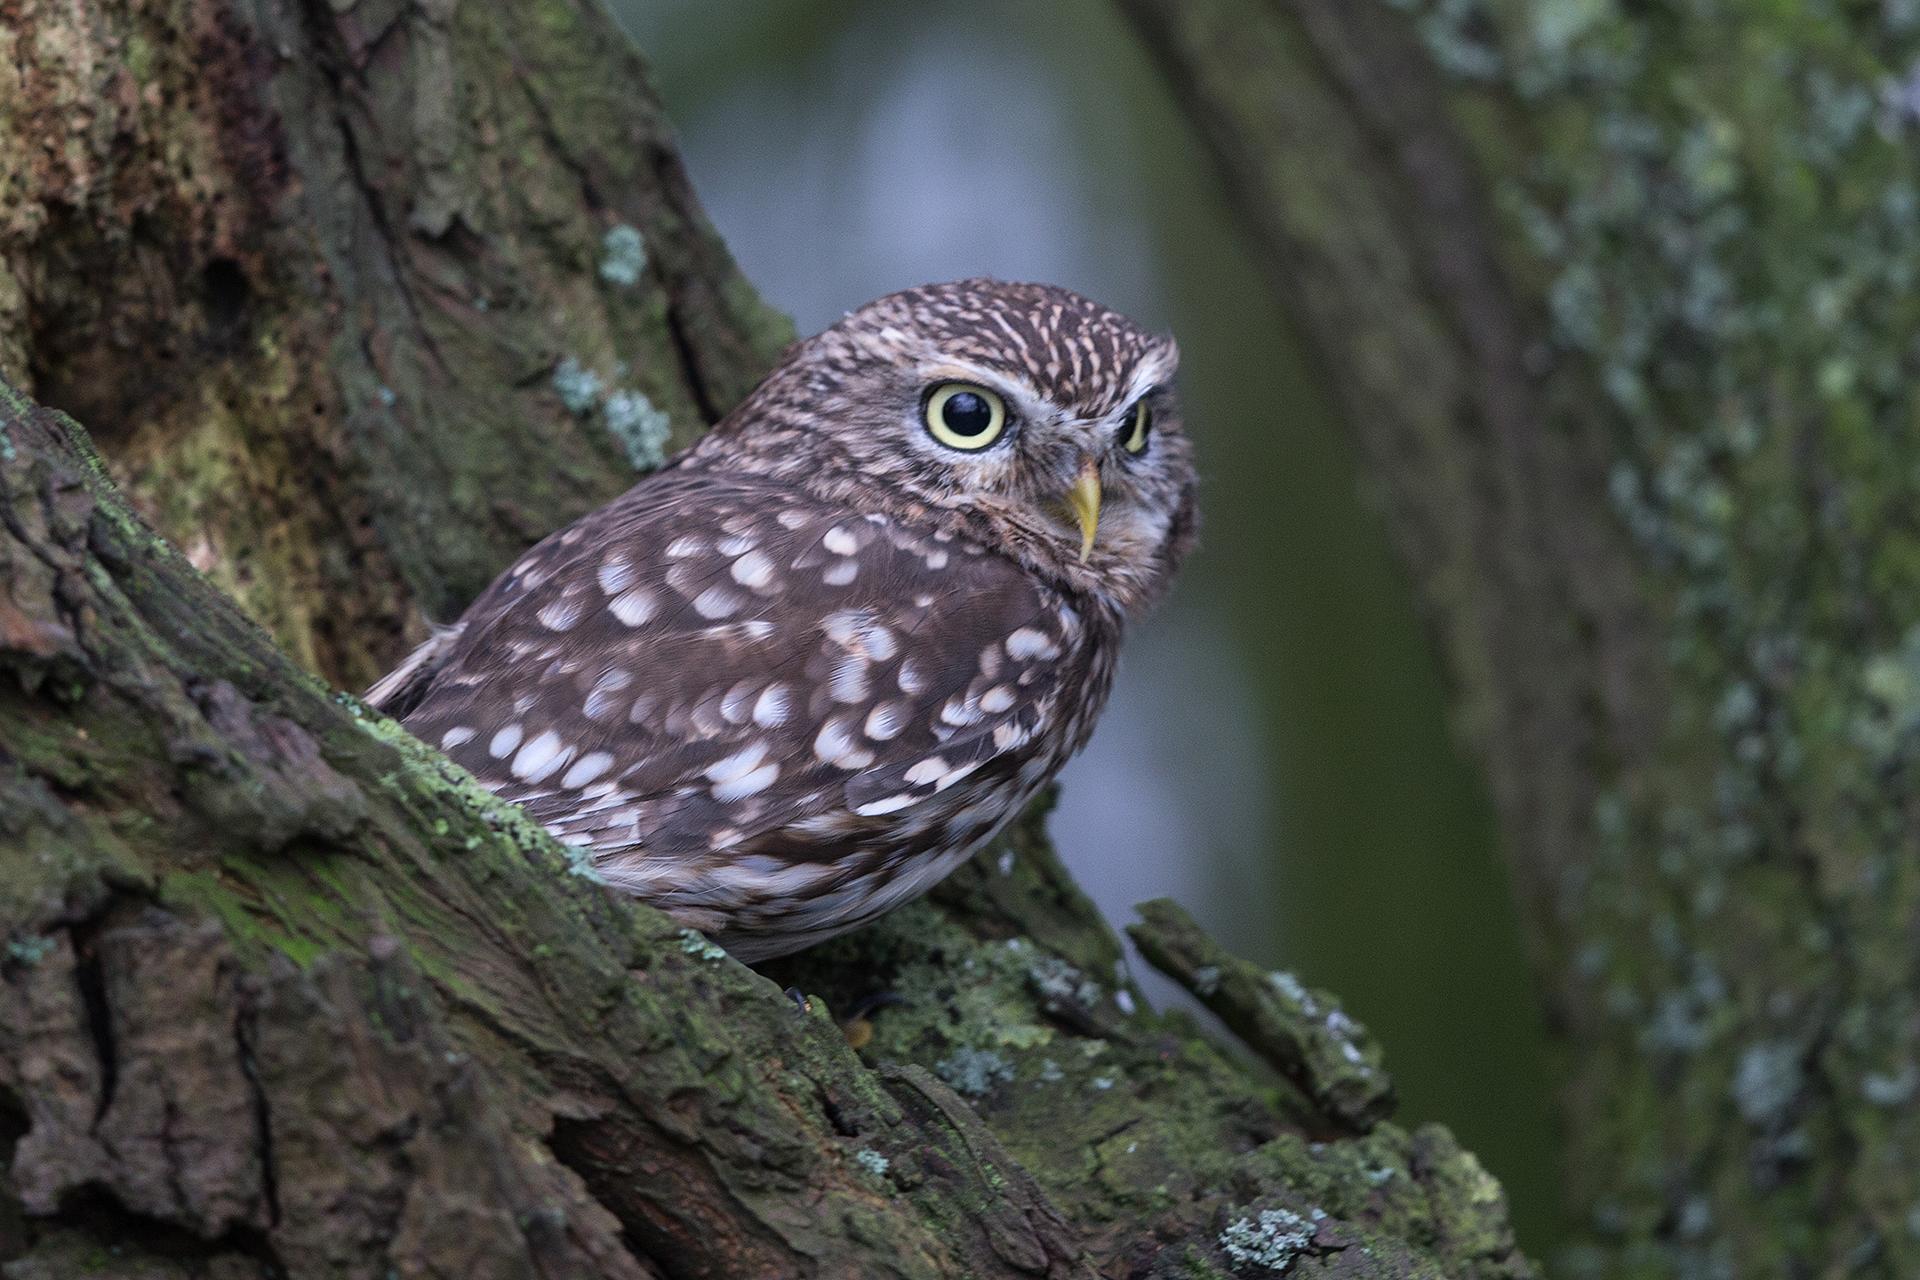 Little Owl, Staffordshire